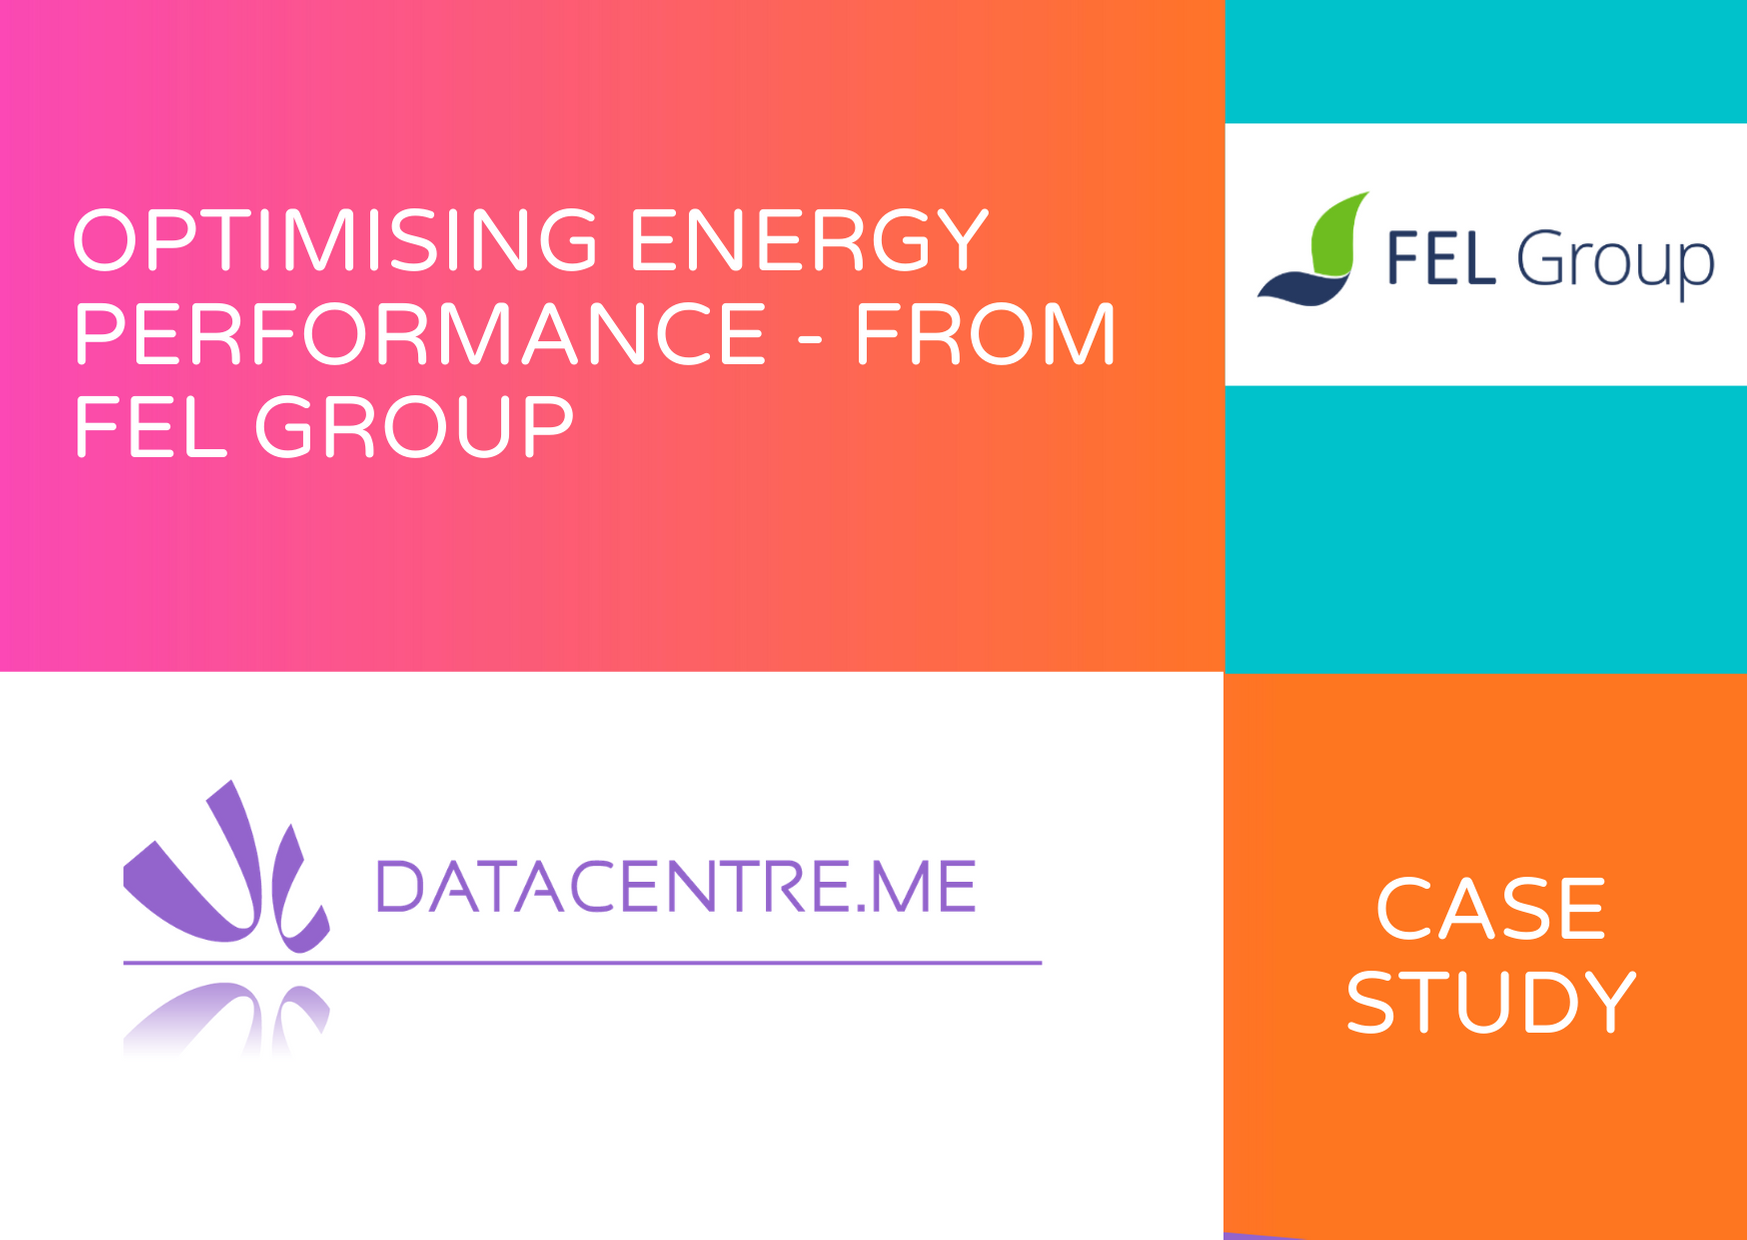 FEL Group case study Leeds Nov 2020